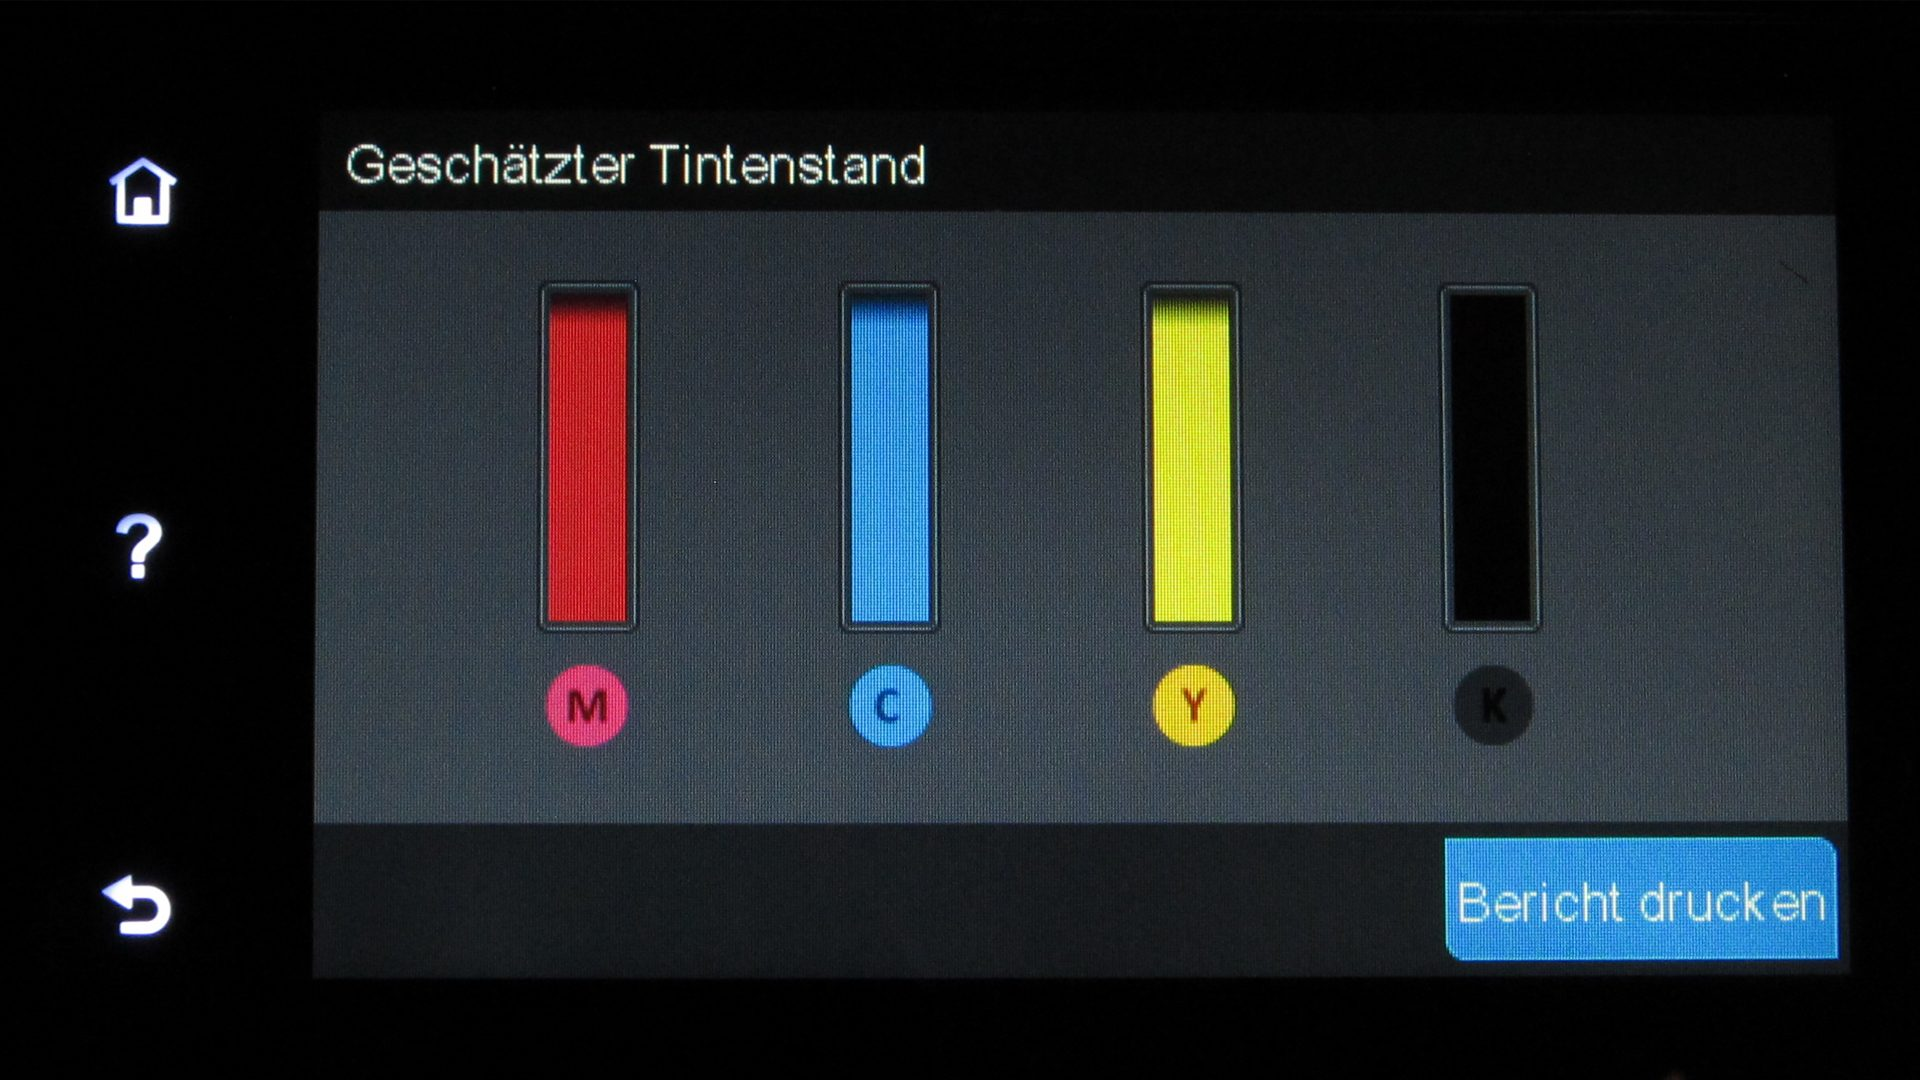 HP-Officejet-Pro-8620–Display-Tintenstand